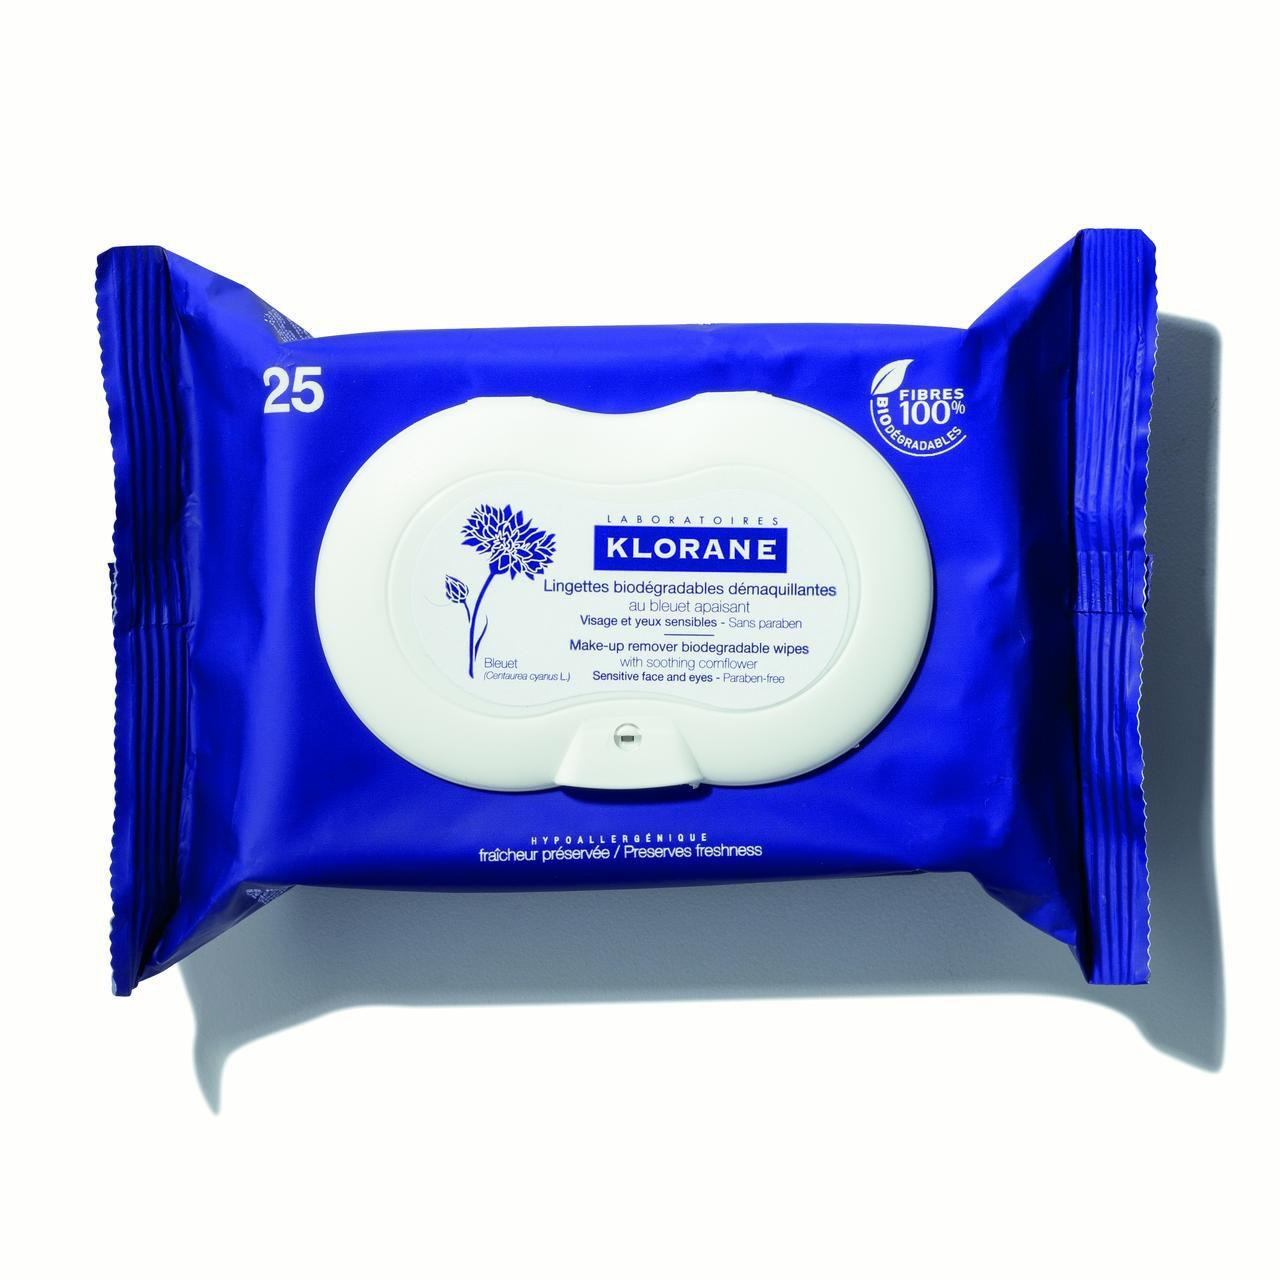 Klorane Make-up Remover Biodegradable Wipes